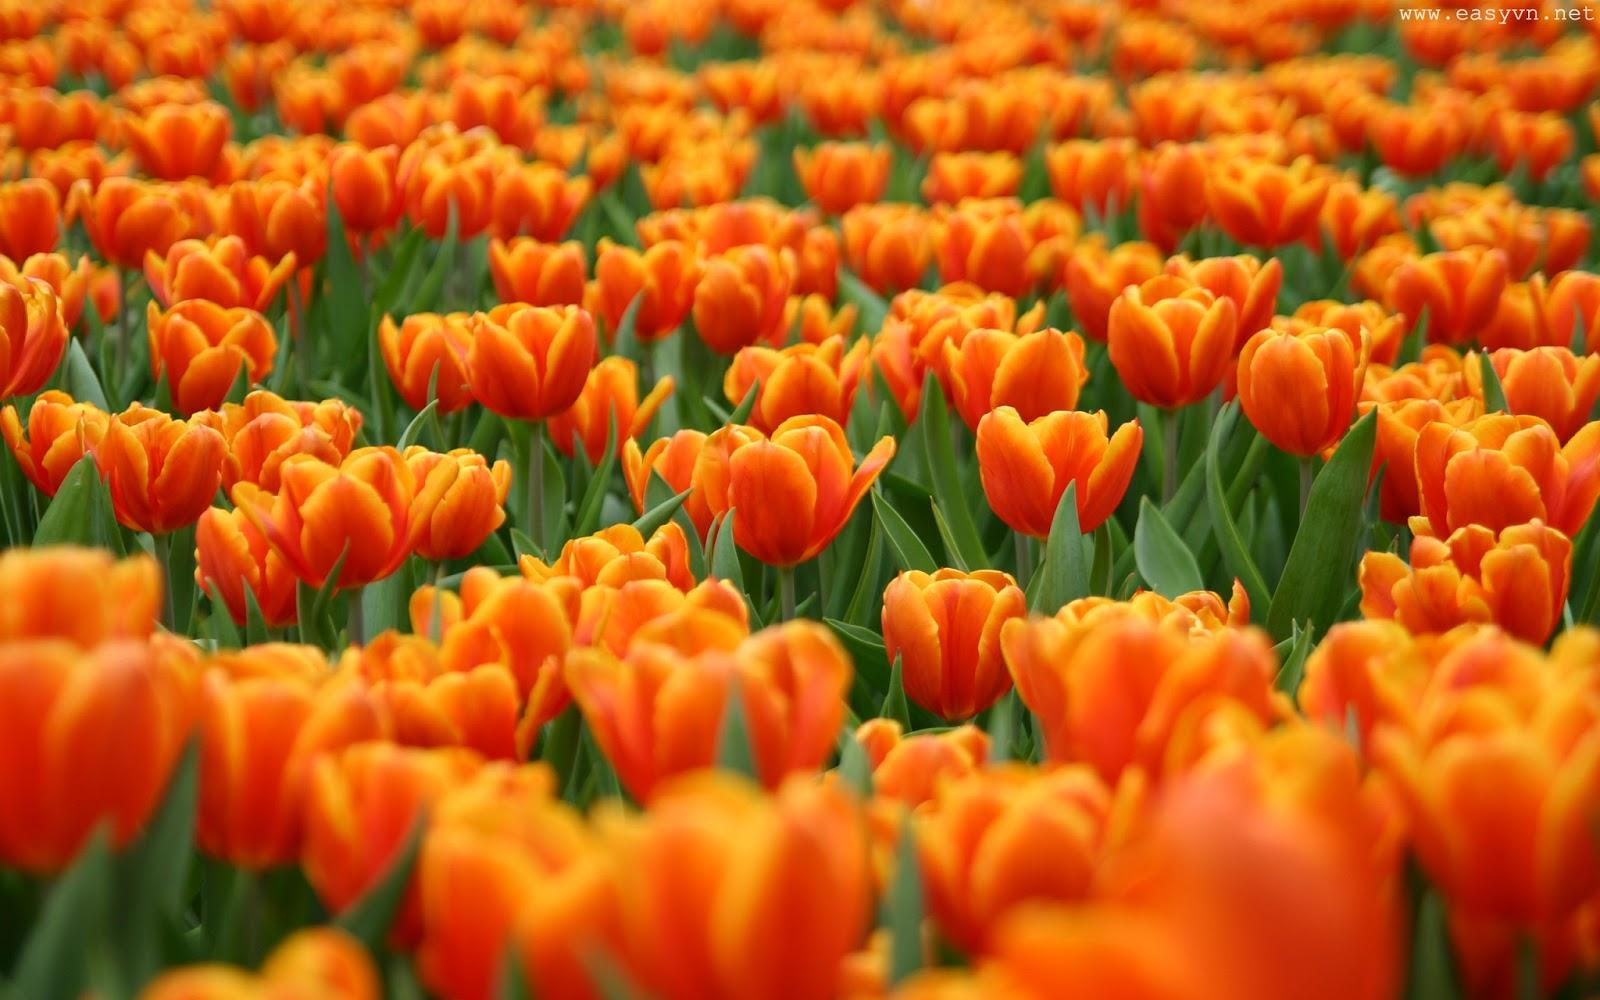 Tulip Flowers Beautiful Natural Scenery Hd Wallpaper High